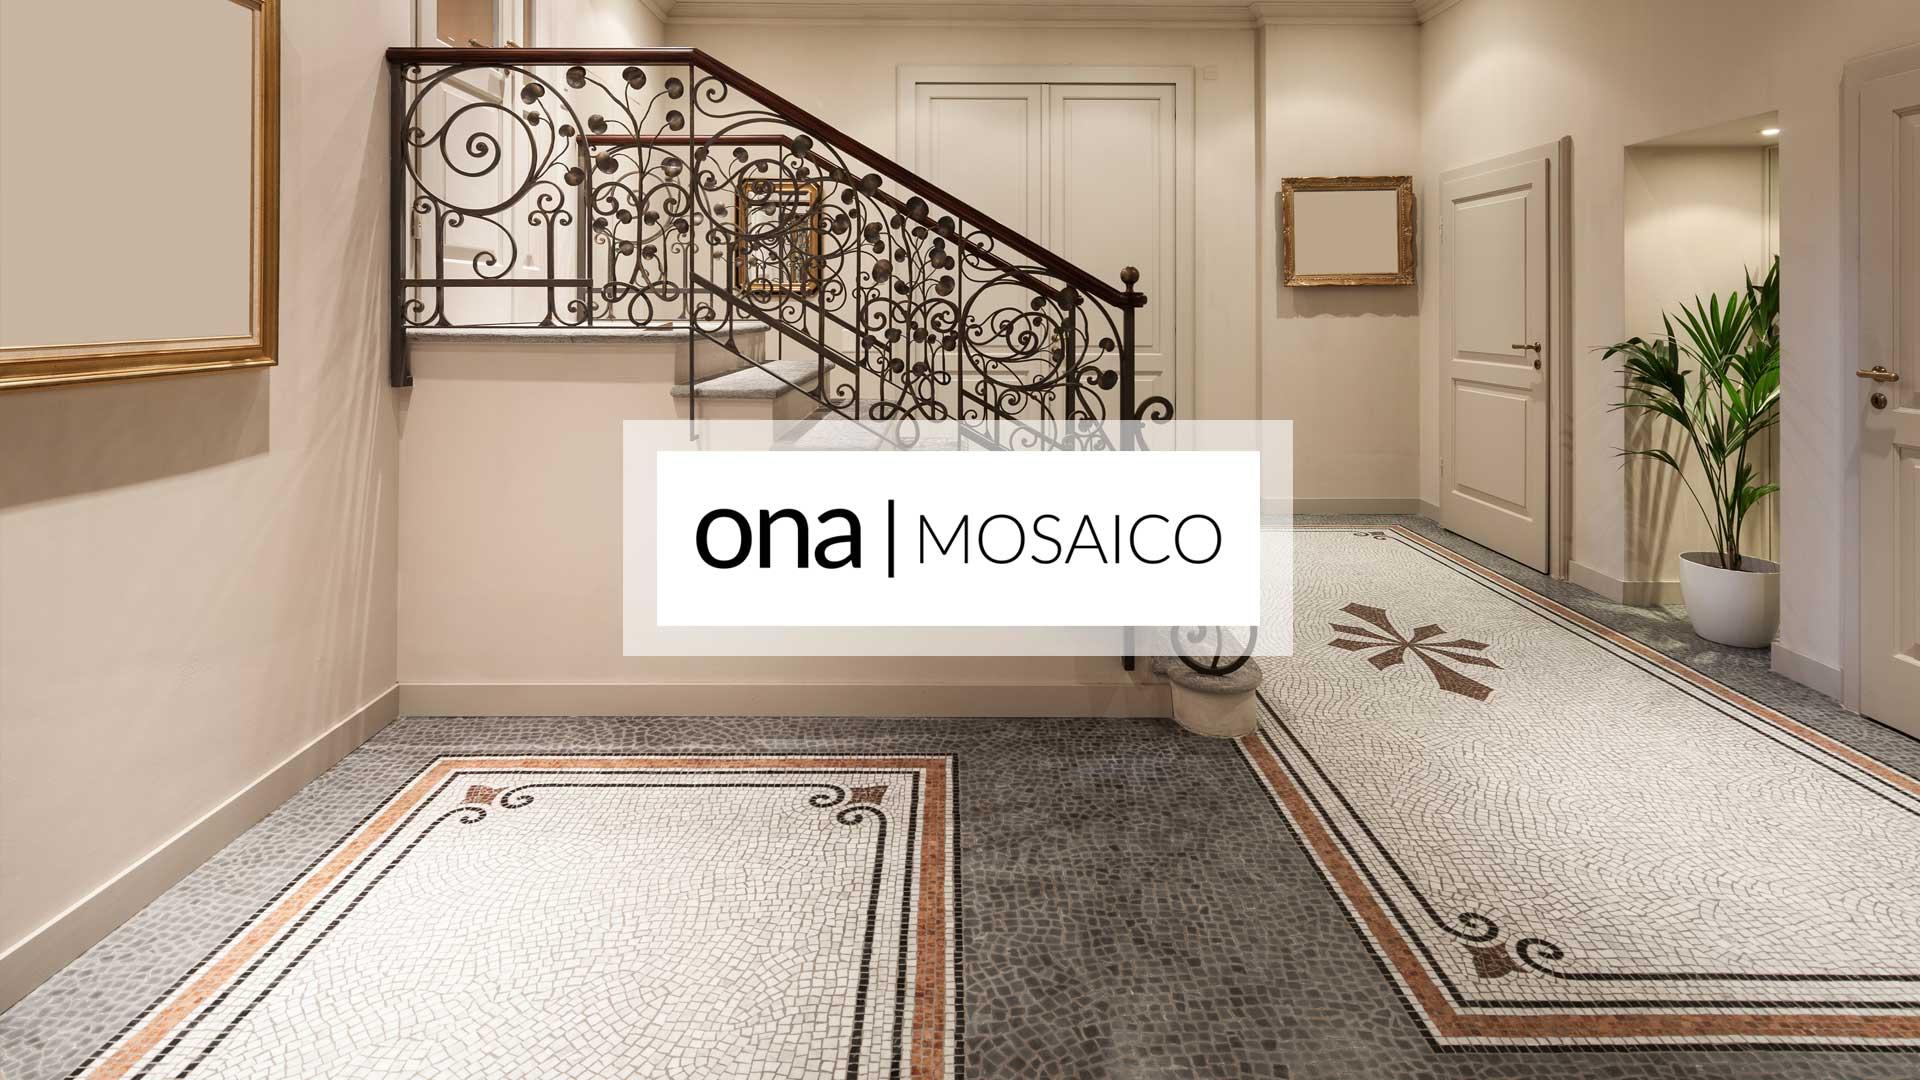 pavimento-suelo-ona-mosaico